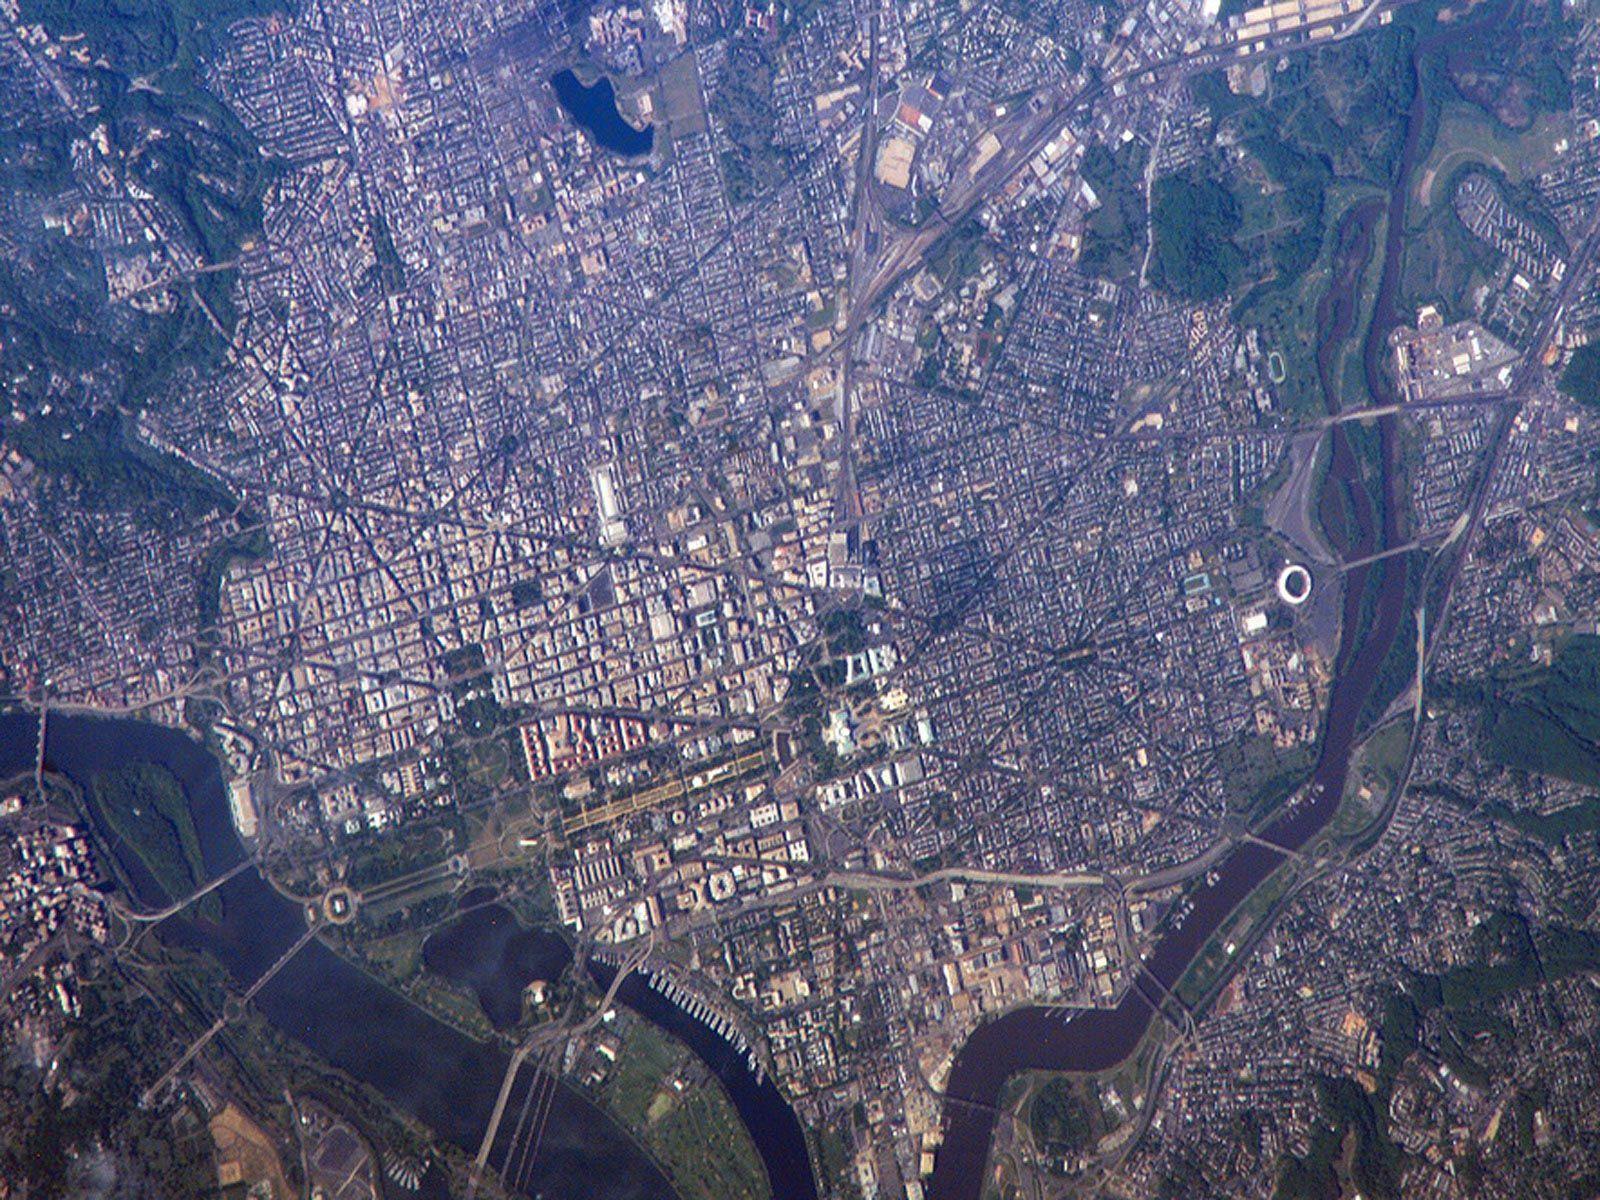 Washington From International Space Station Space Pinterest - Washington dc map conspiracy